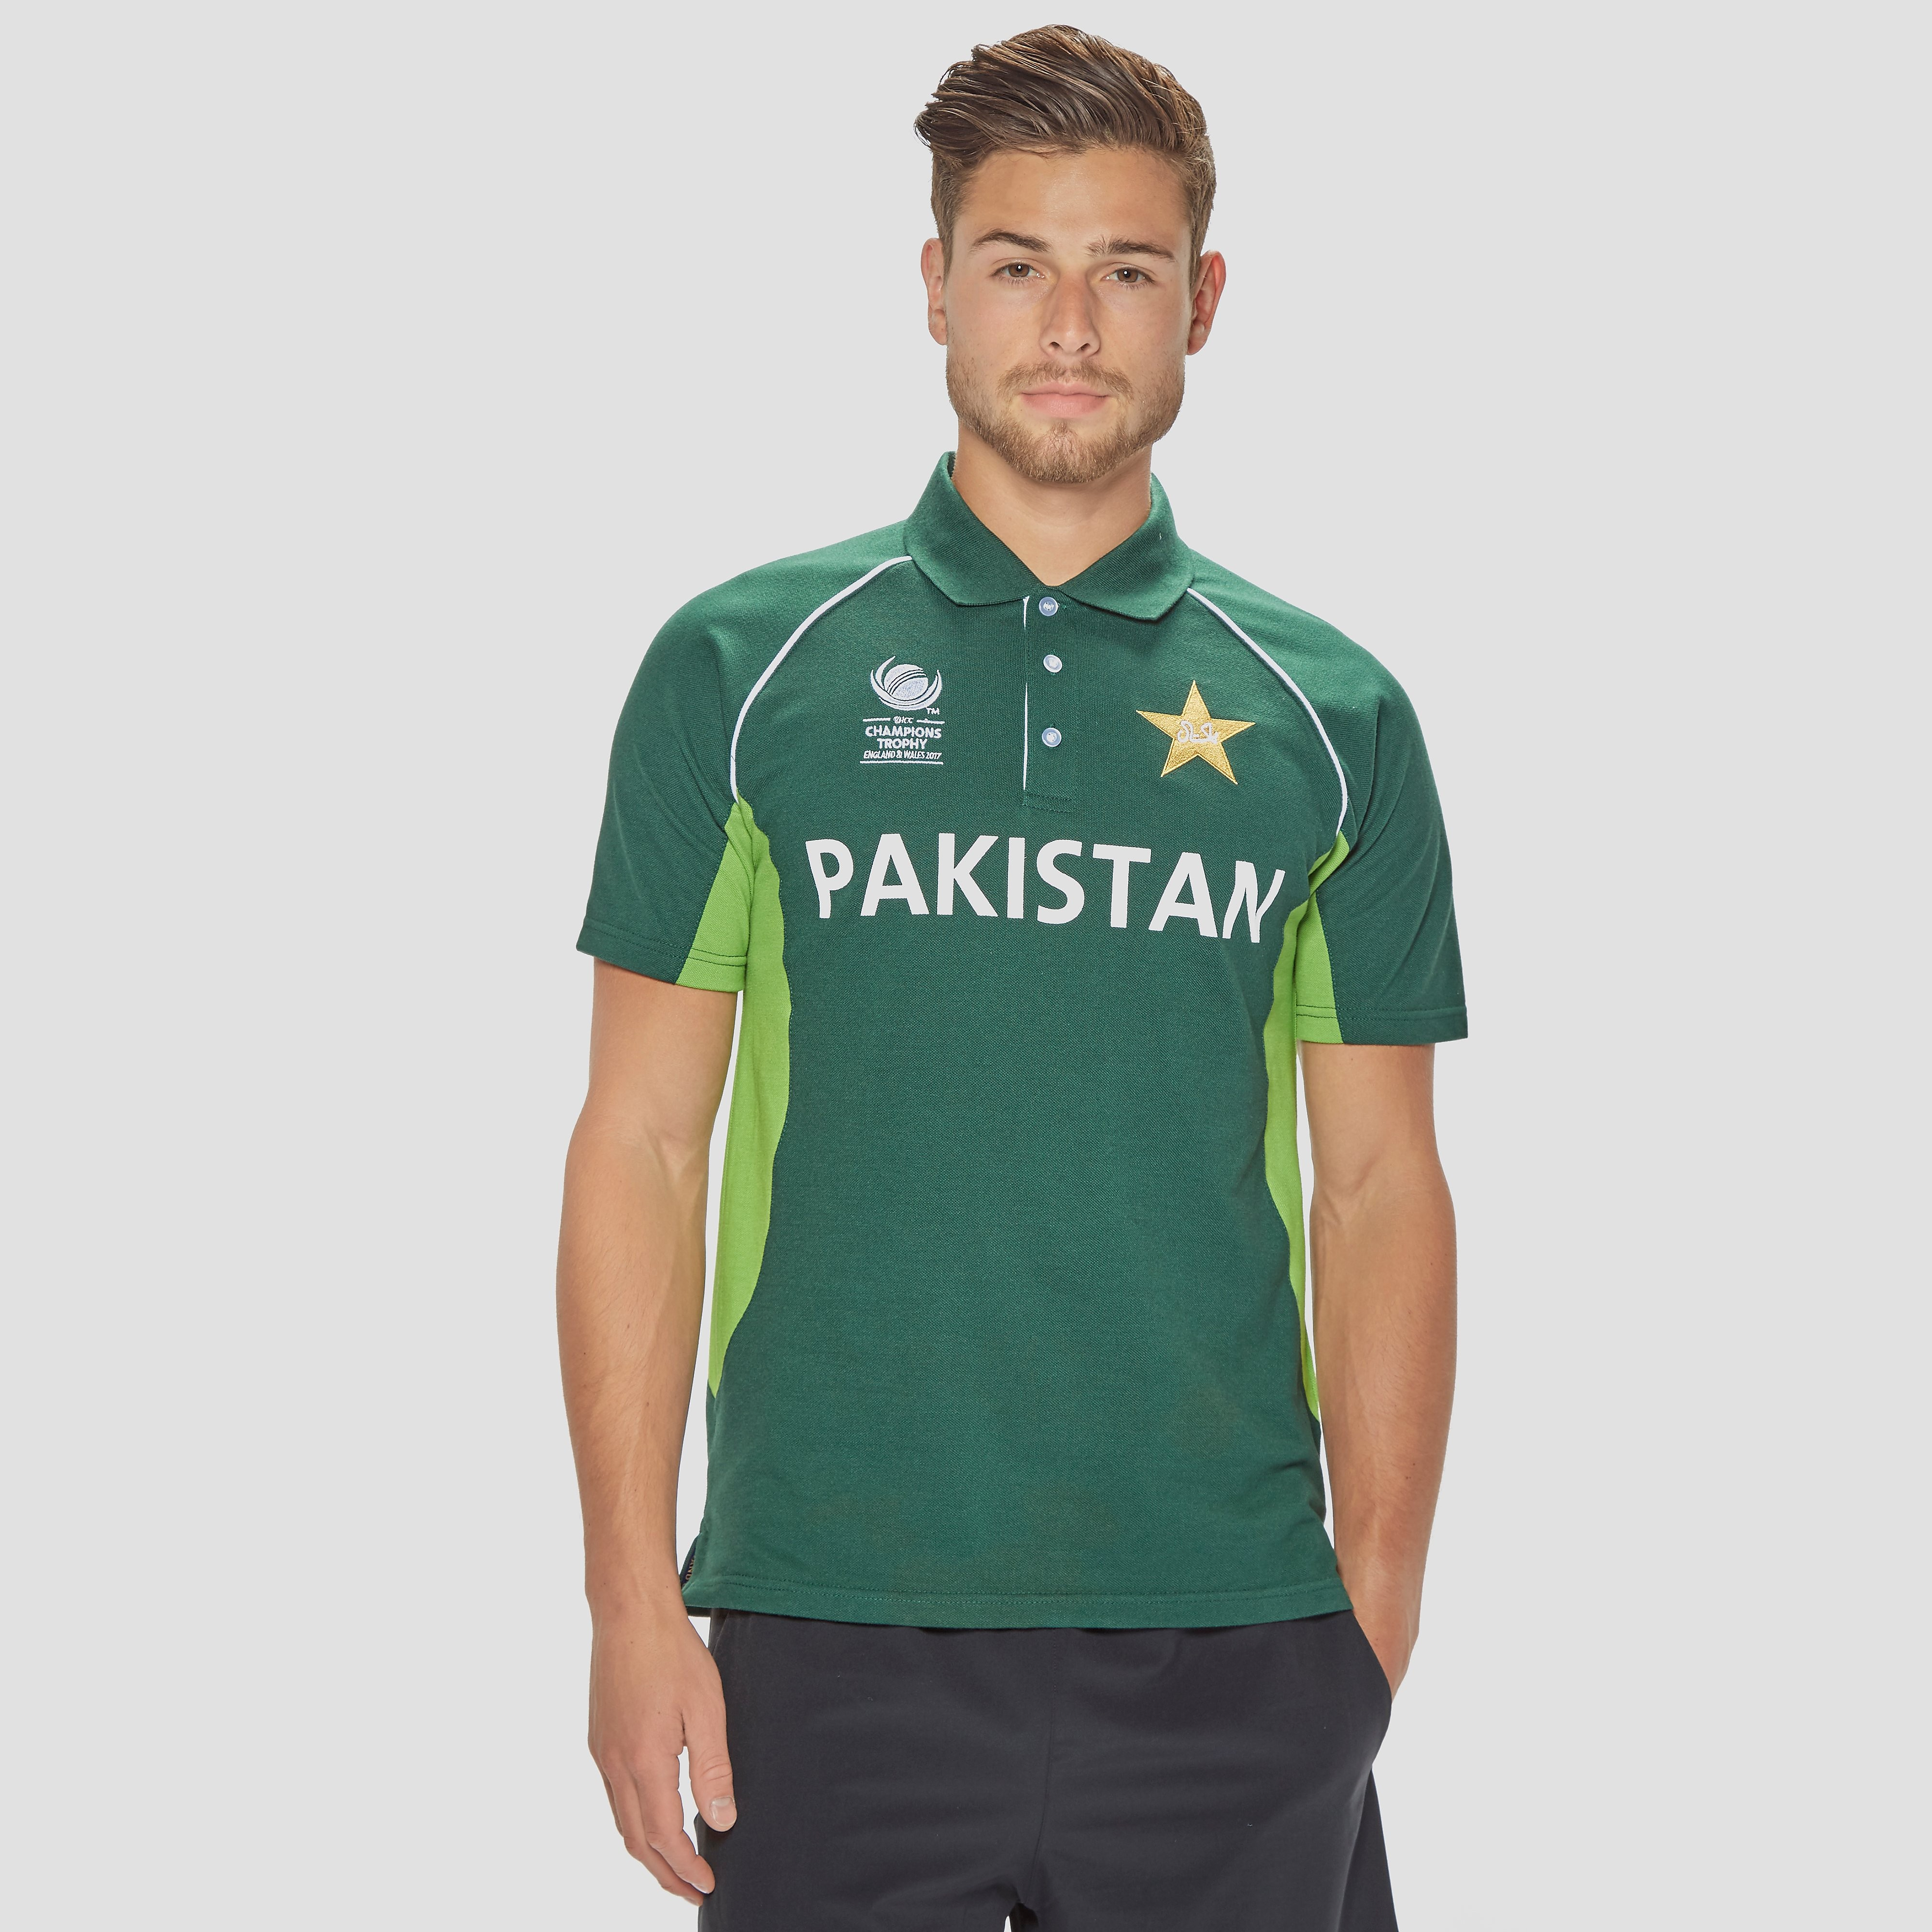 Sportfolio ICC Champions Trophy 2017 Pakistan Men's Cricket Jersey